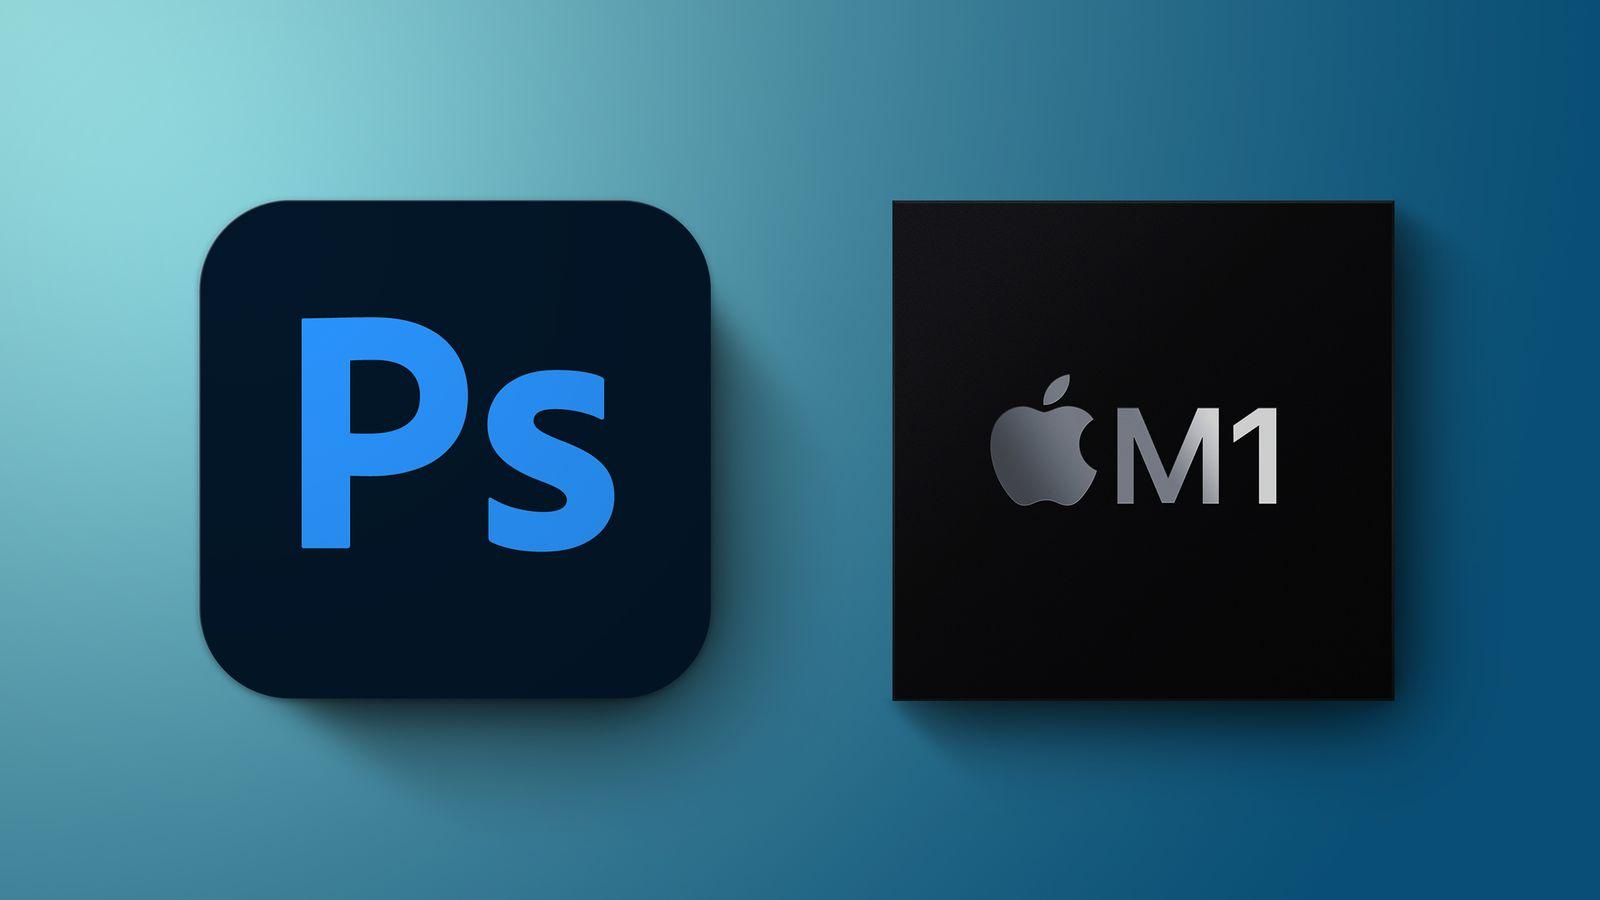 Apple Silicon Macs now run Photoshop natively